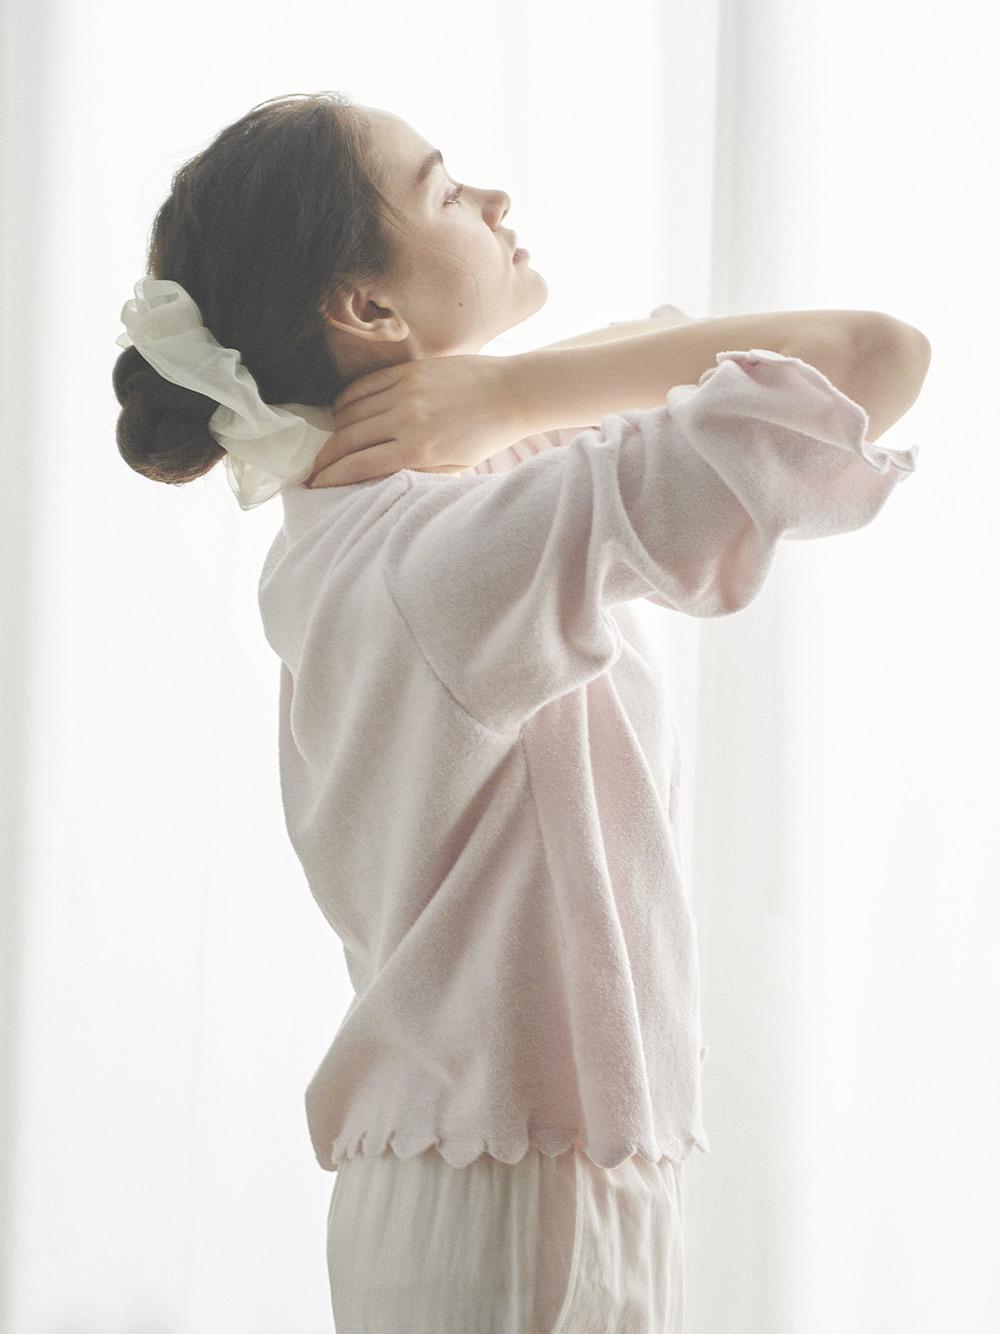 【SAKURA FAIR】'スムーズィーライト'スカラップカーディガン | PWNT211116